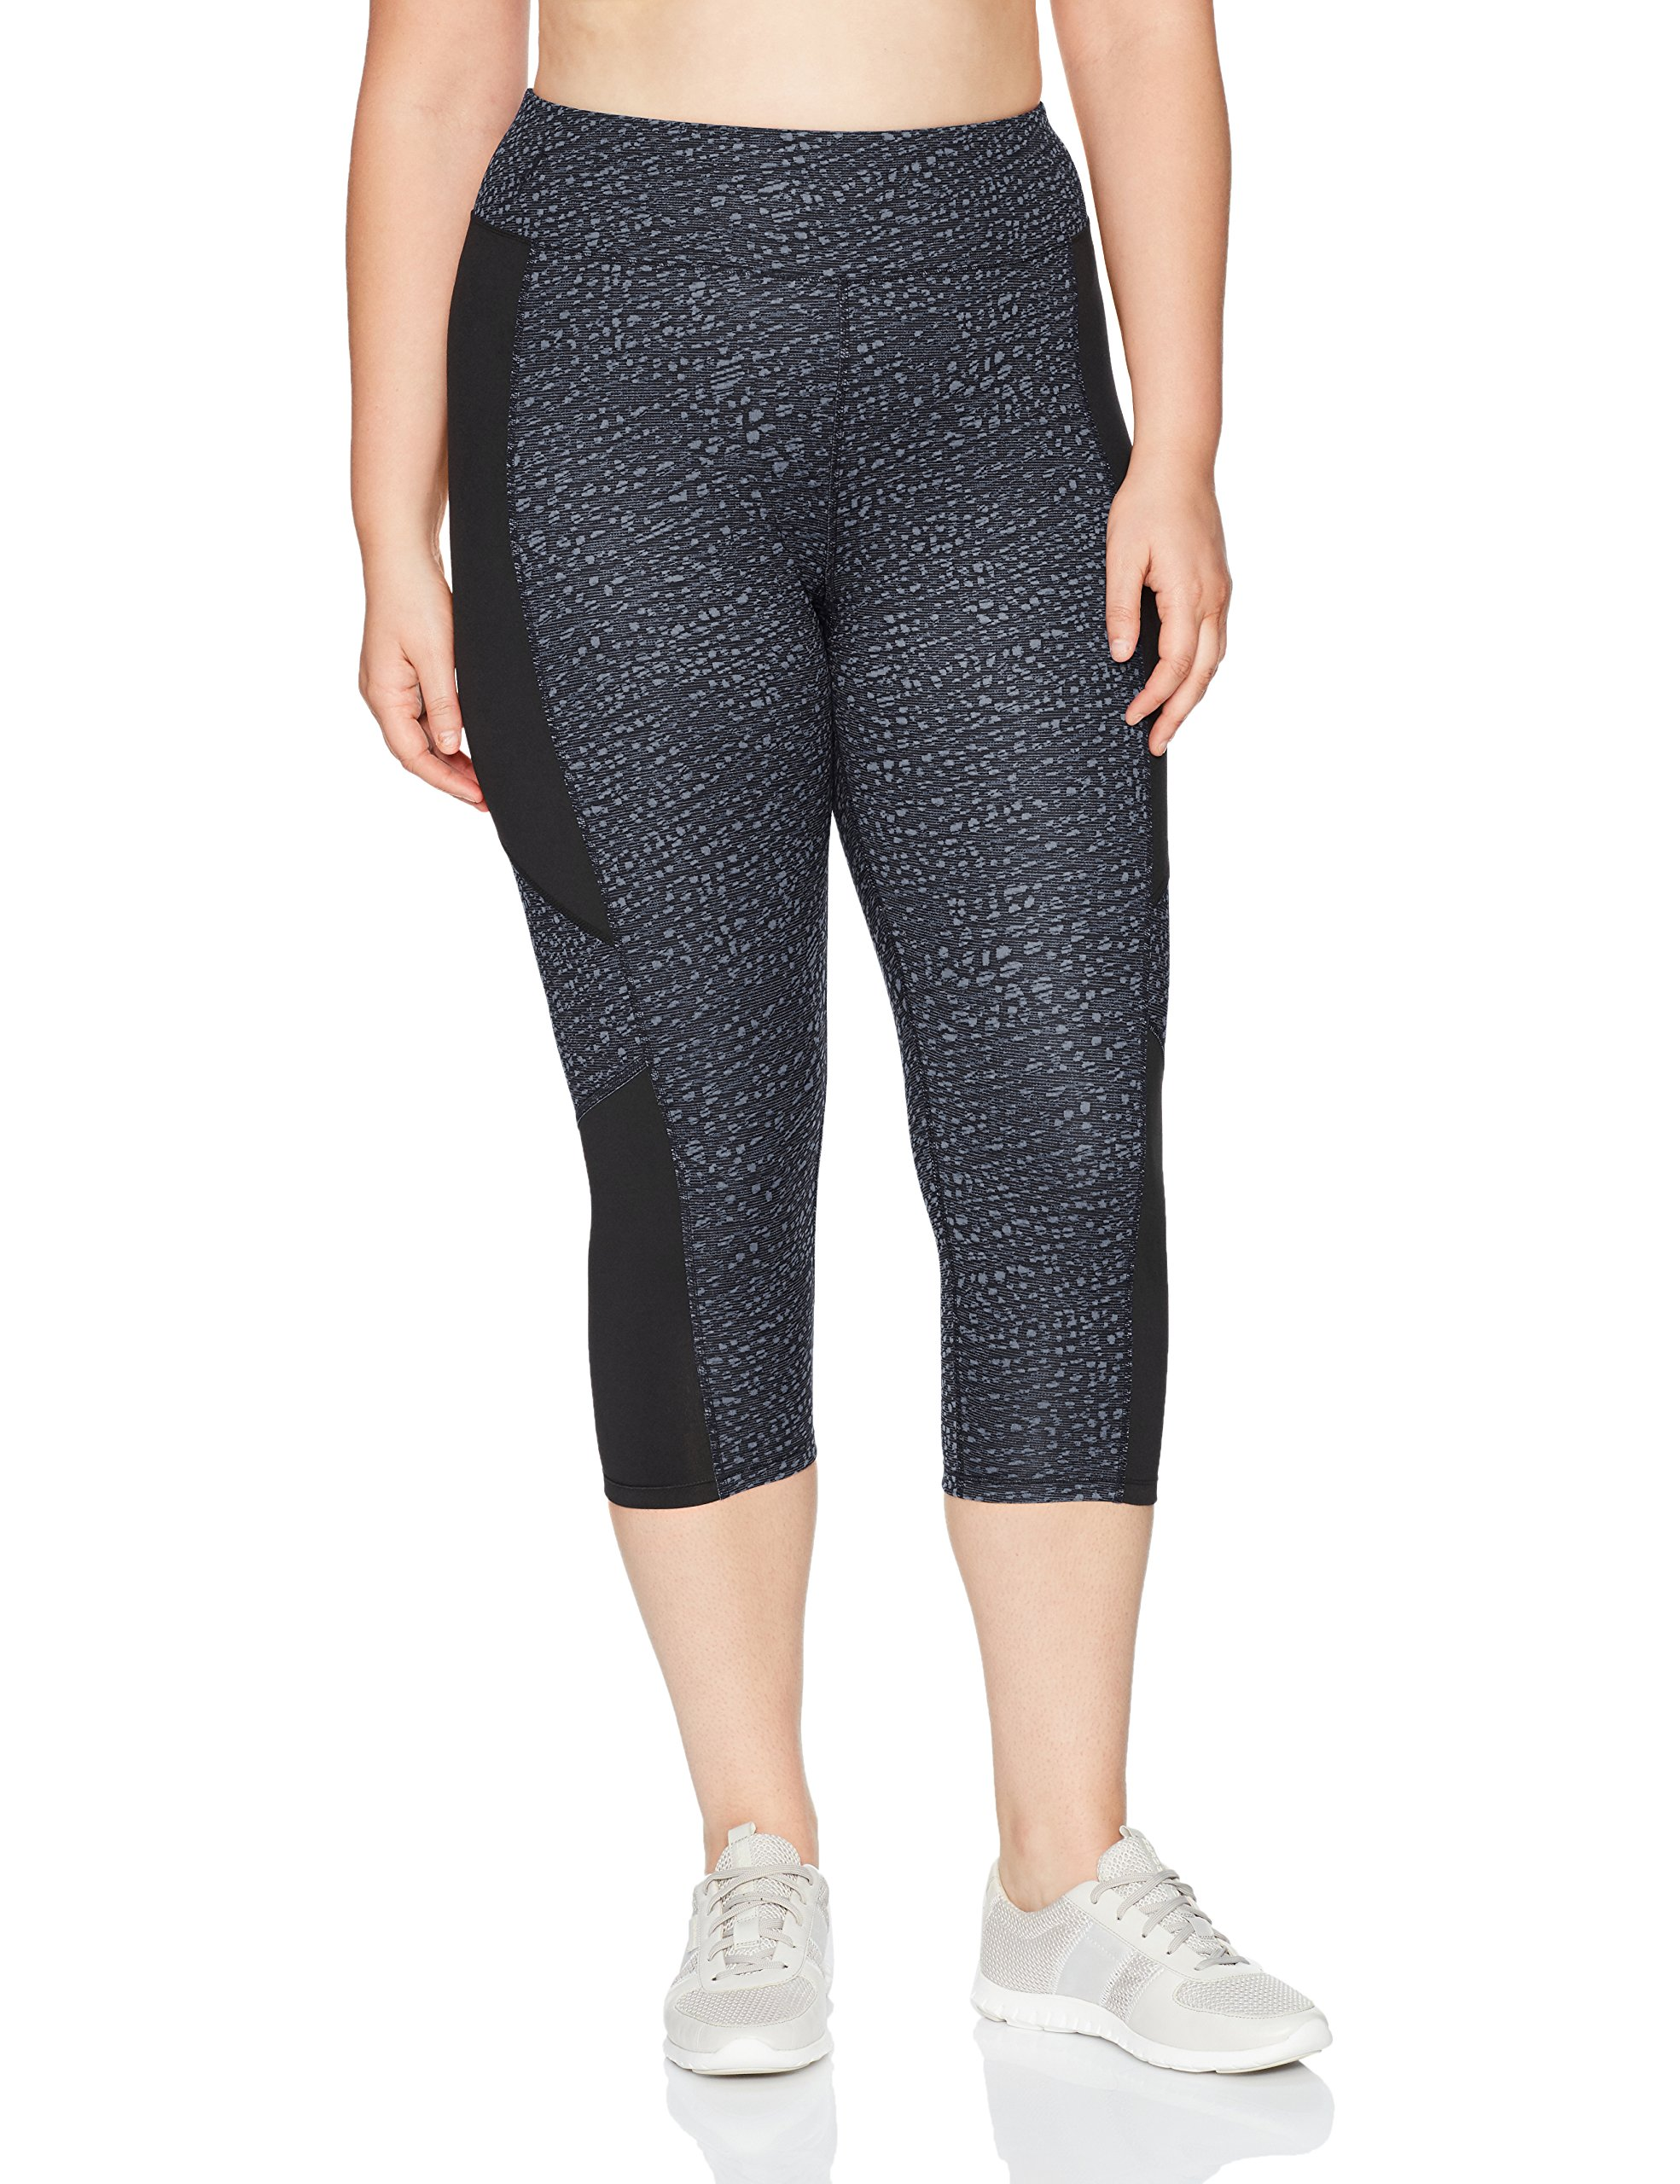 Just My Size Women's Plus Size Active Pieced Stretch Capri, Spot On Slate Grey/Black, 2X